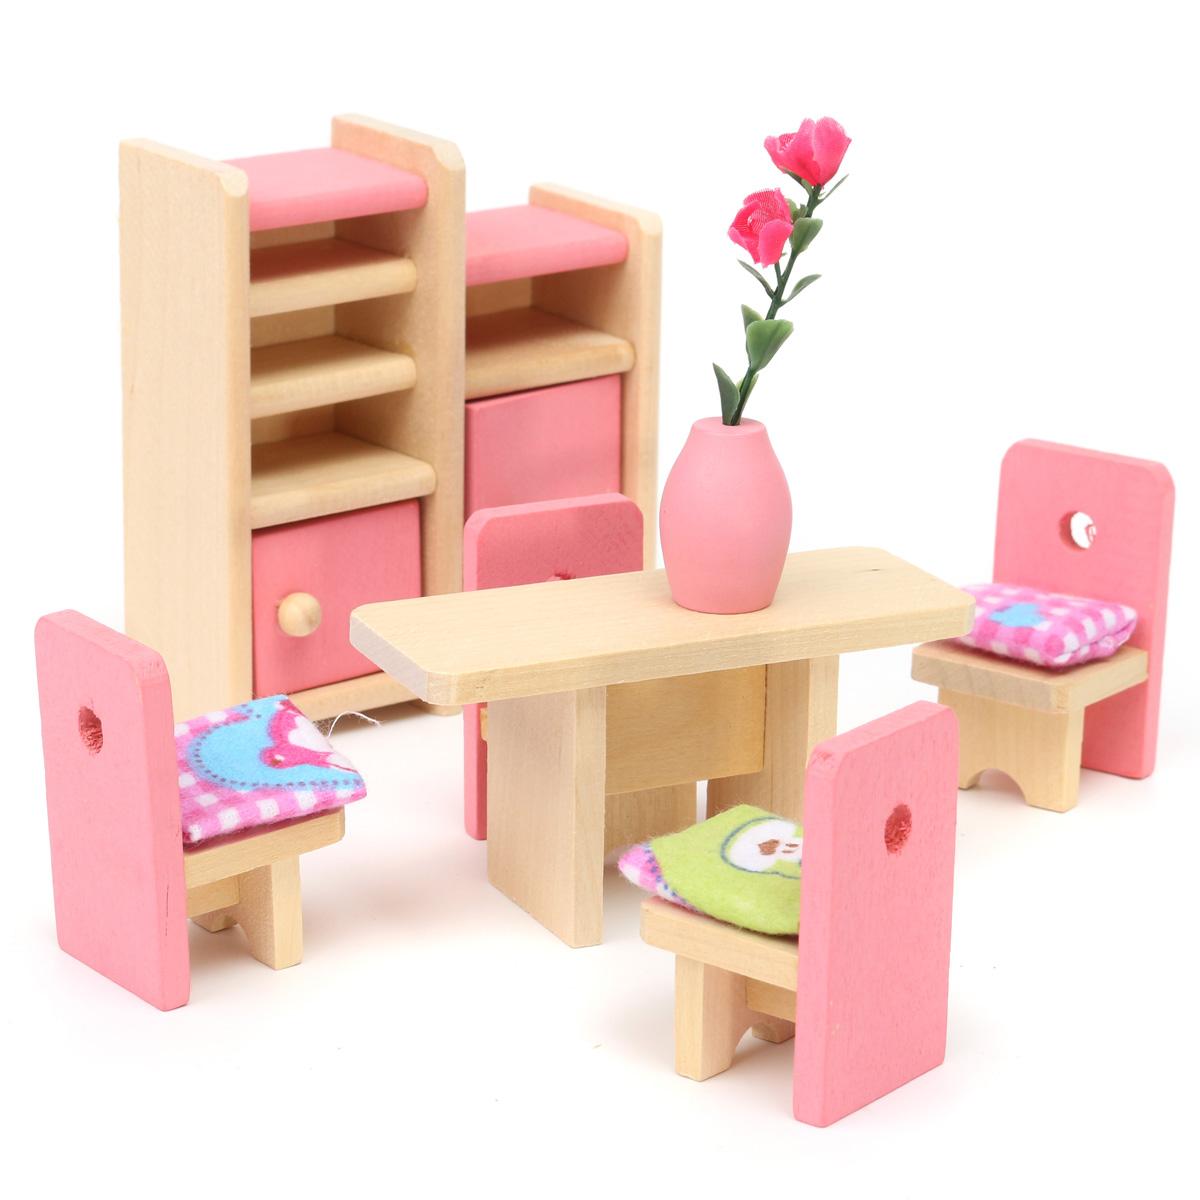 Wooden Doll Set Children Toys Miniature House Family Furniture Kit